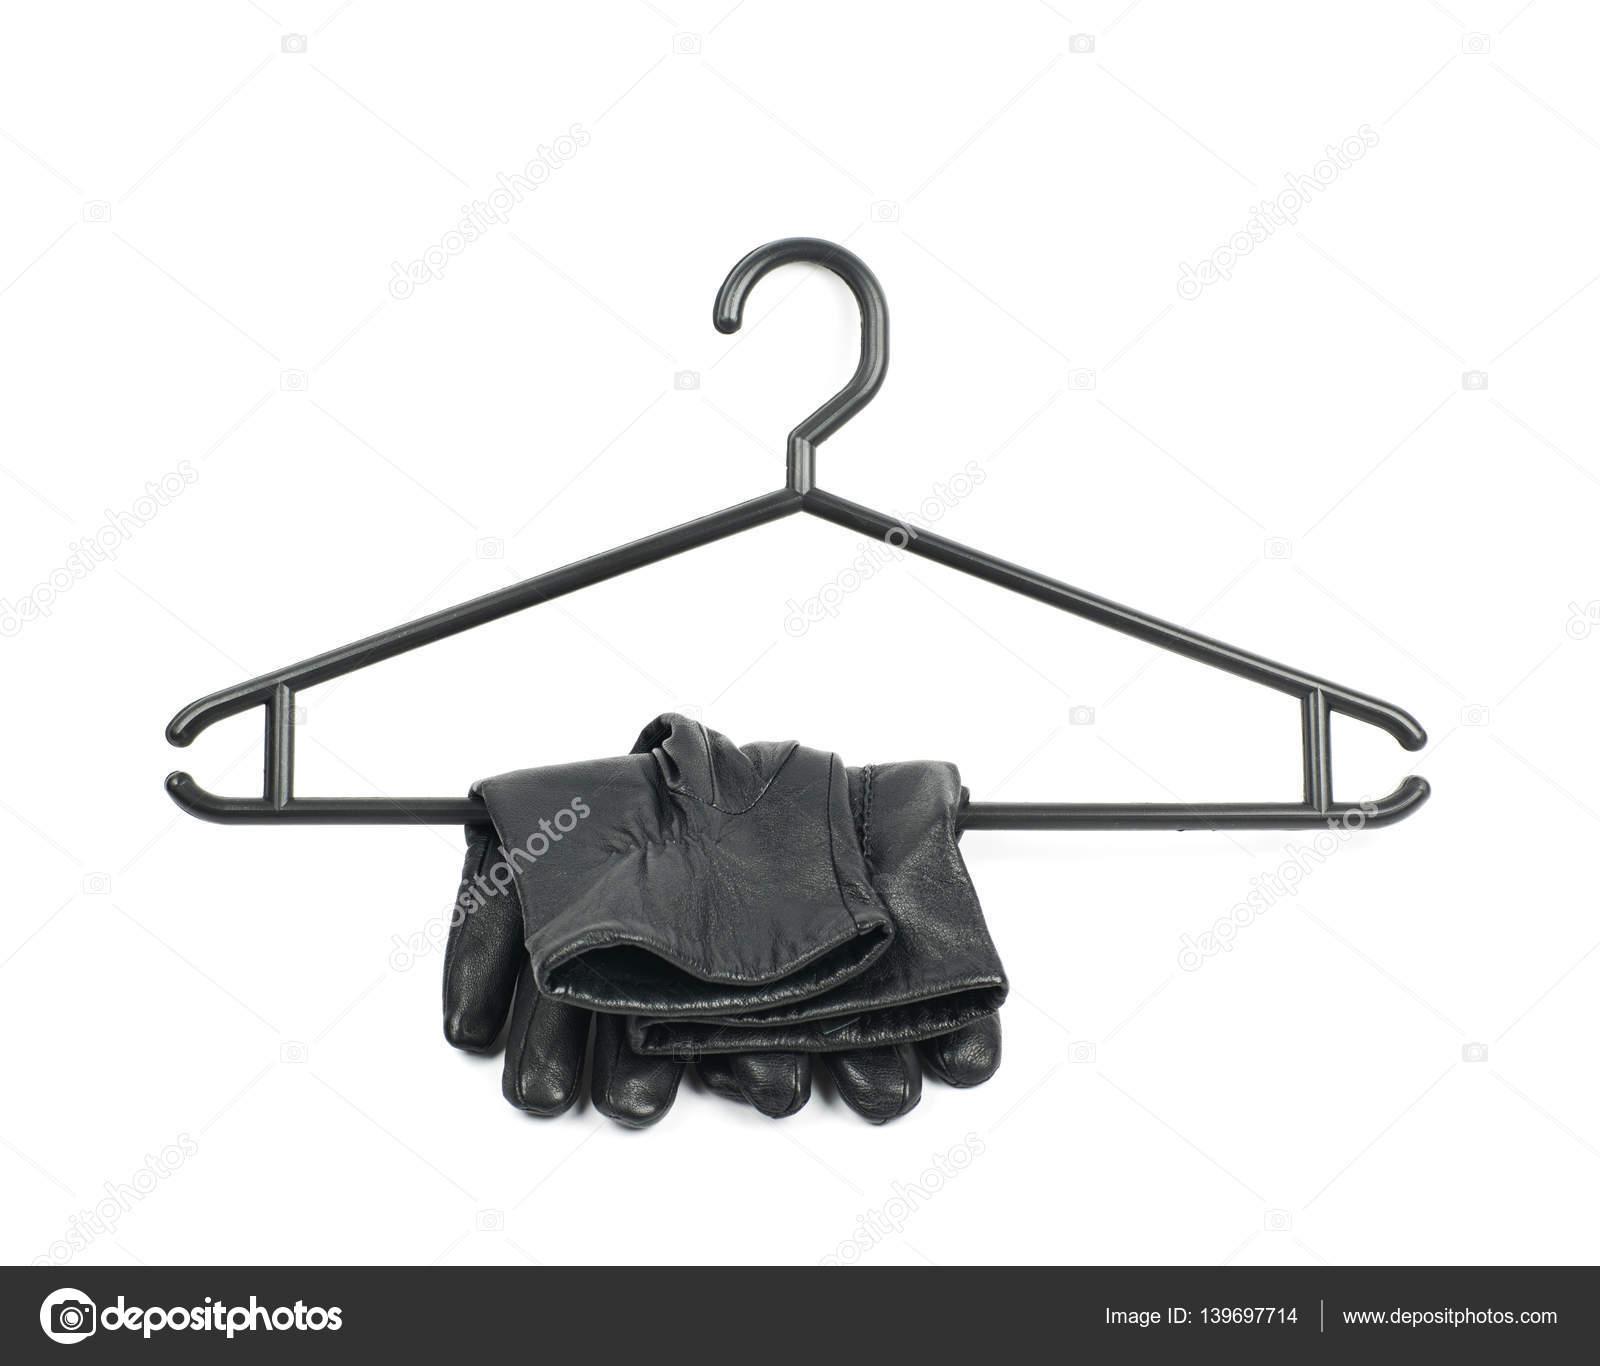 Schwarzer Kunststoff Kleiderbügel isoliert — Stockfoto © nbvf89 ...